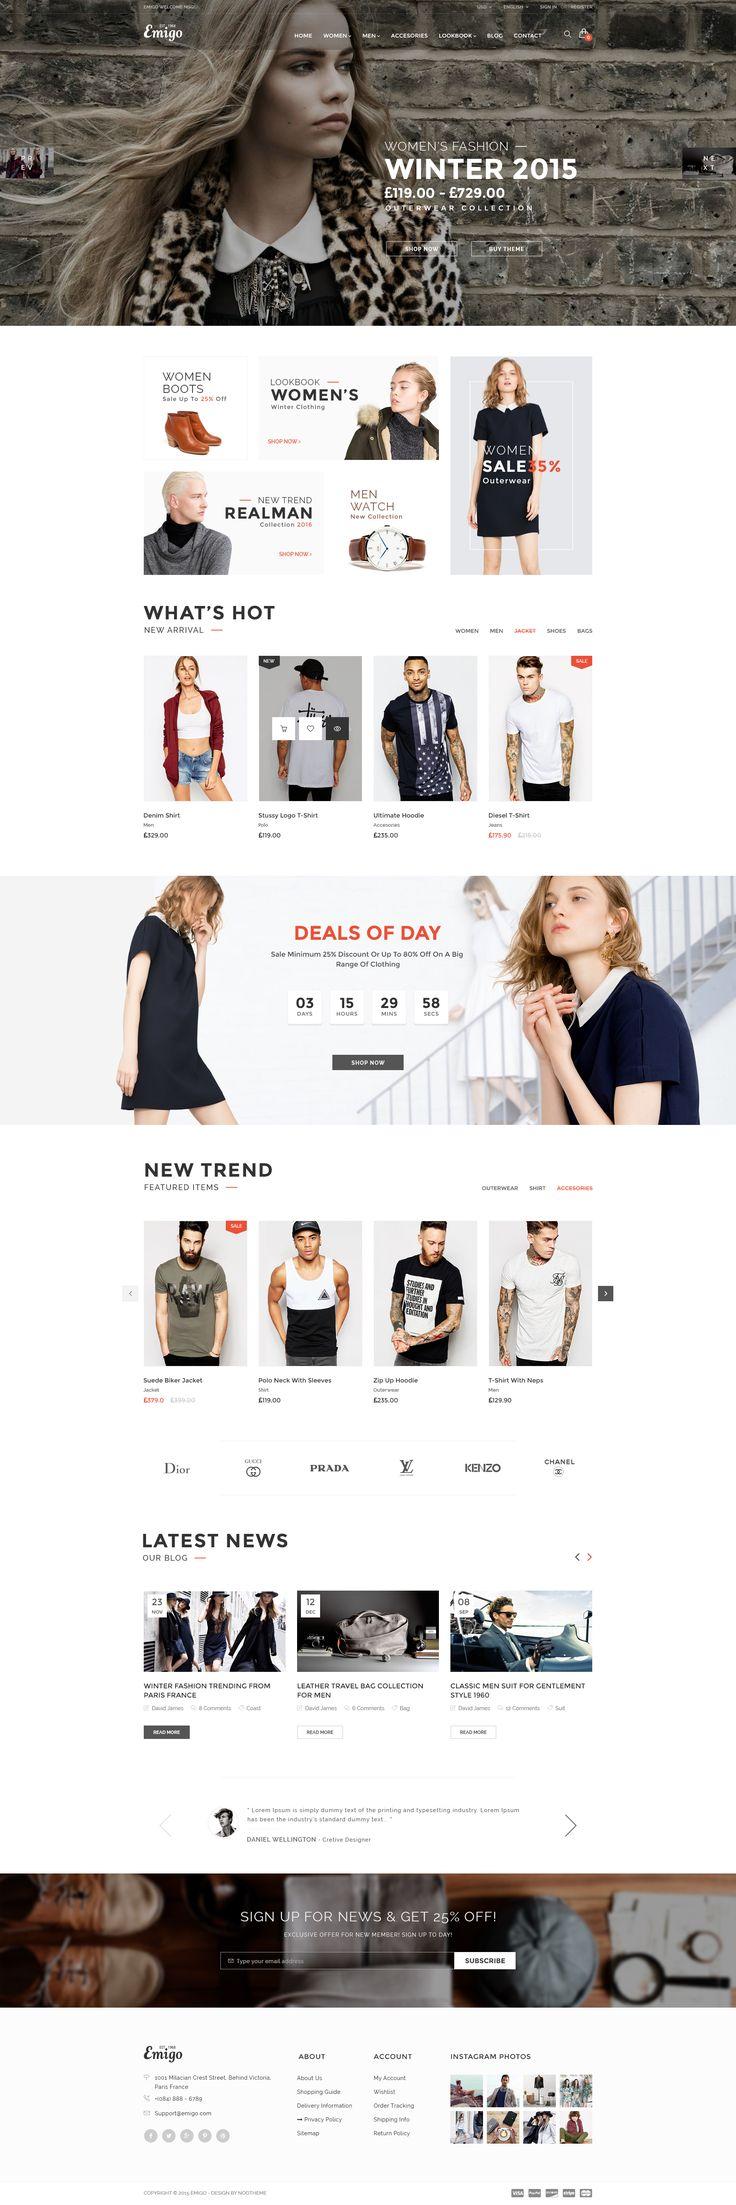 Emigo - Multi Concept eCommerce PSD Template • Download ➝ https://themeforest.net/item/emigo-multi-concept-ecommerce-psd-template/14020752?ref=pxcr